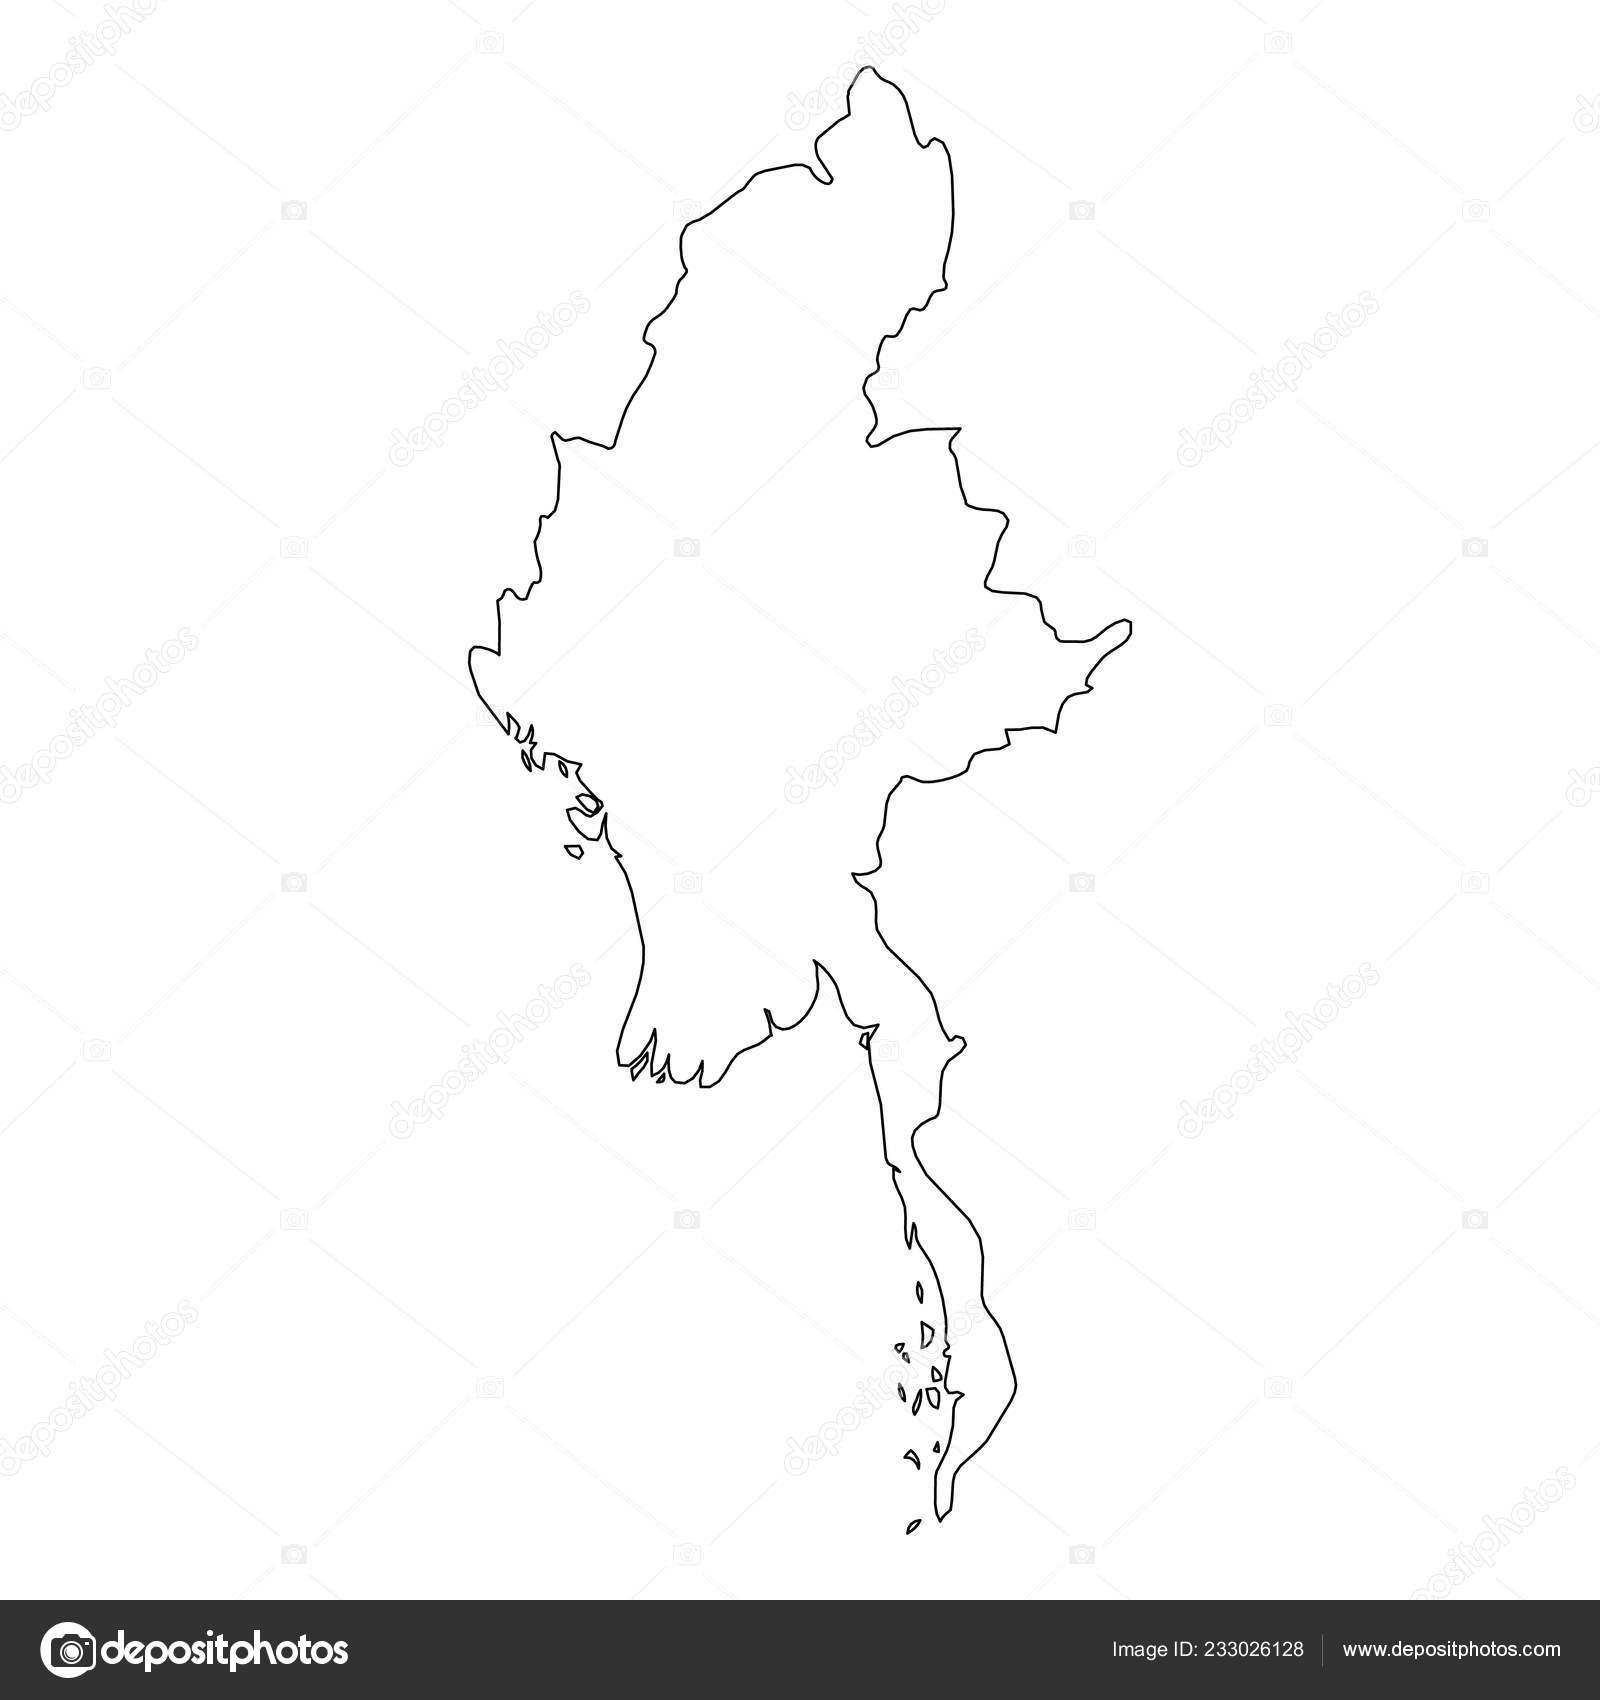 Birmanie Carte Regions.Birmanie Myanmar Contour Noir Solide Frontiere Carte Du Pays D